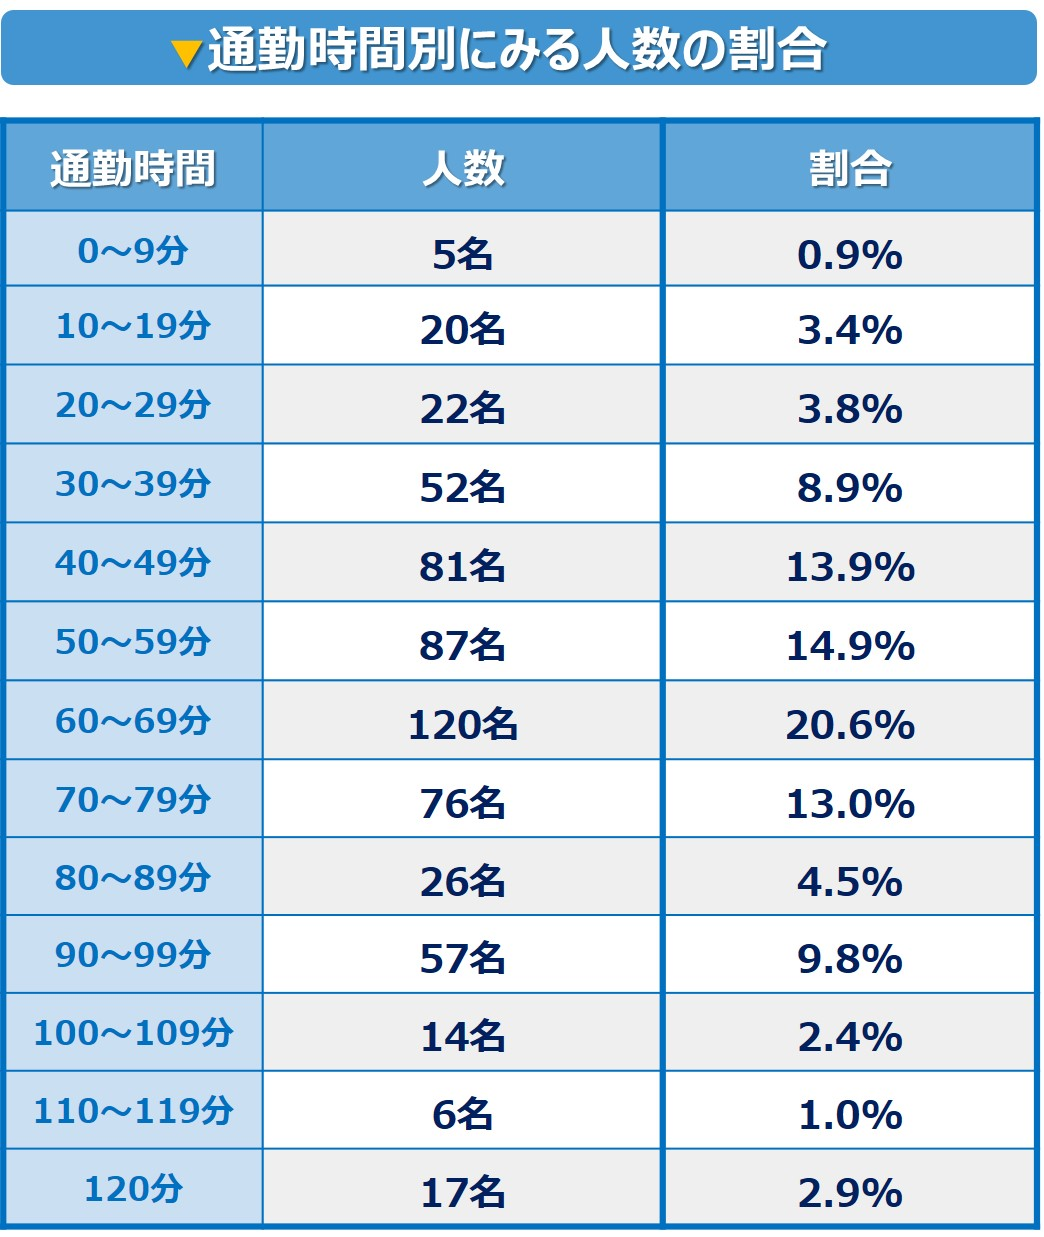 %e9%80%9a%e5%8b%a4%e6%99%82%e9%96%93%e3%81%ae%e5%89%b2%e5%90%88